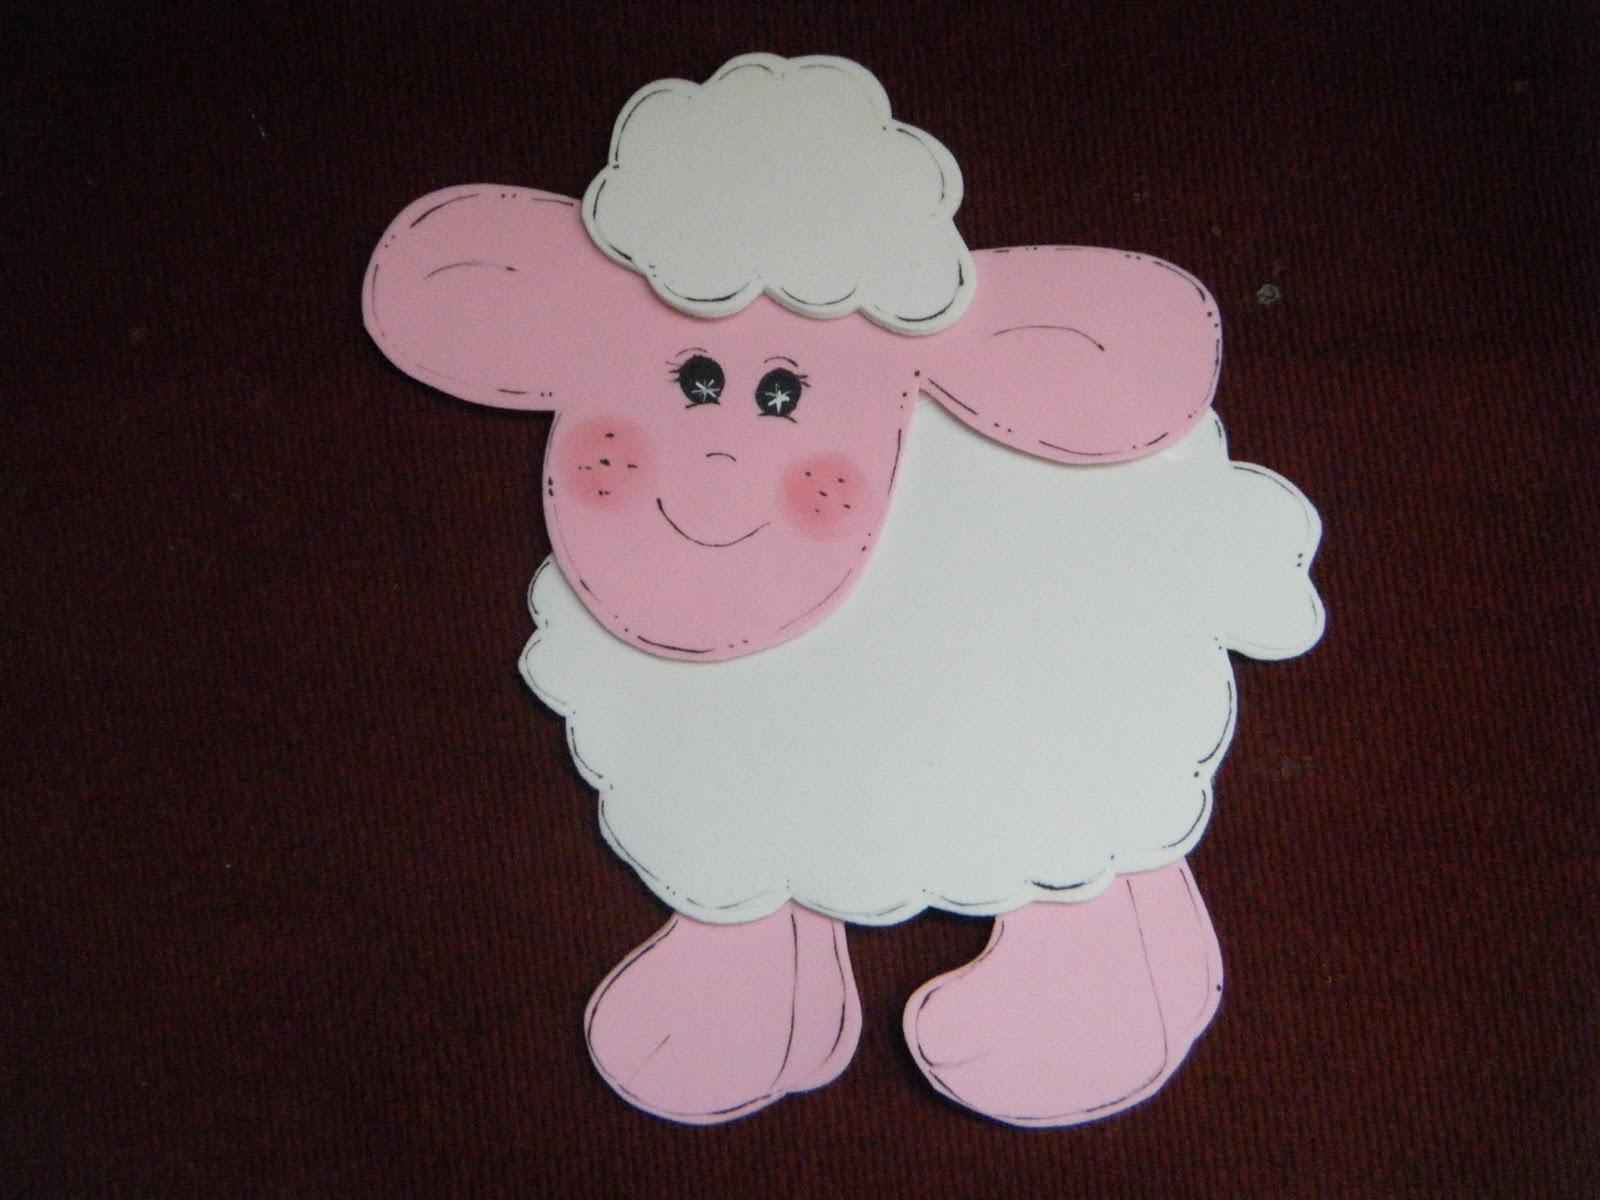 Imagenes de ovejas en foami - Imagui